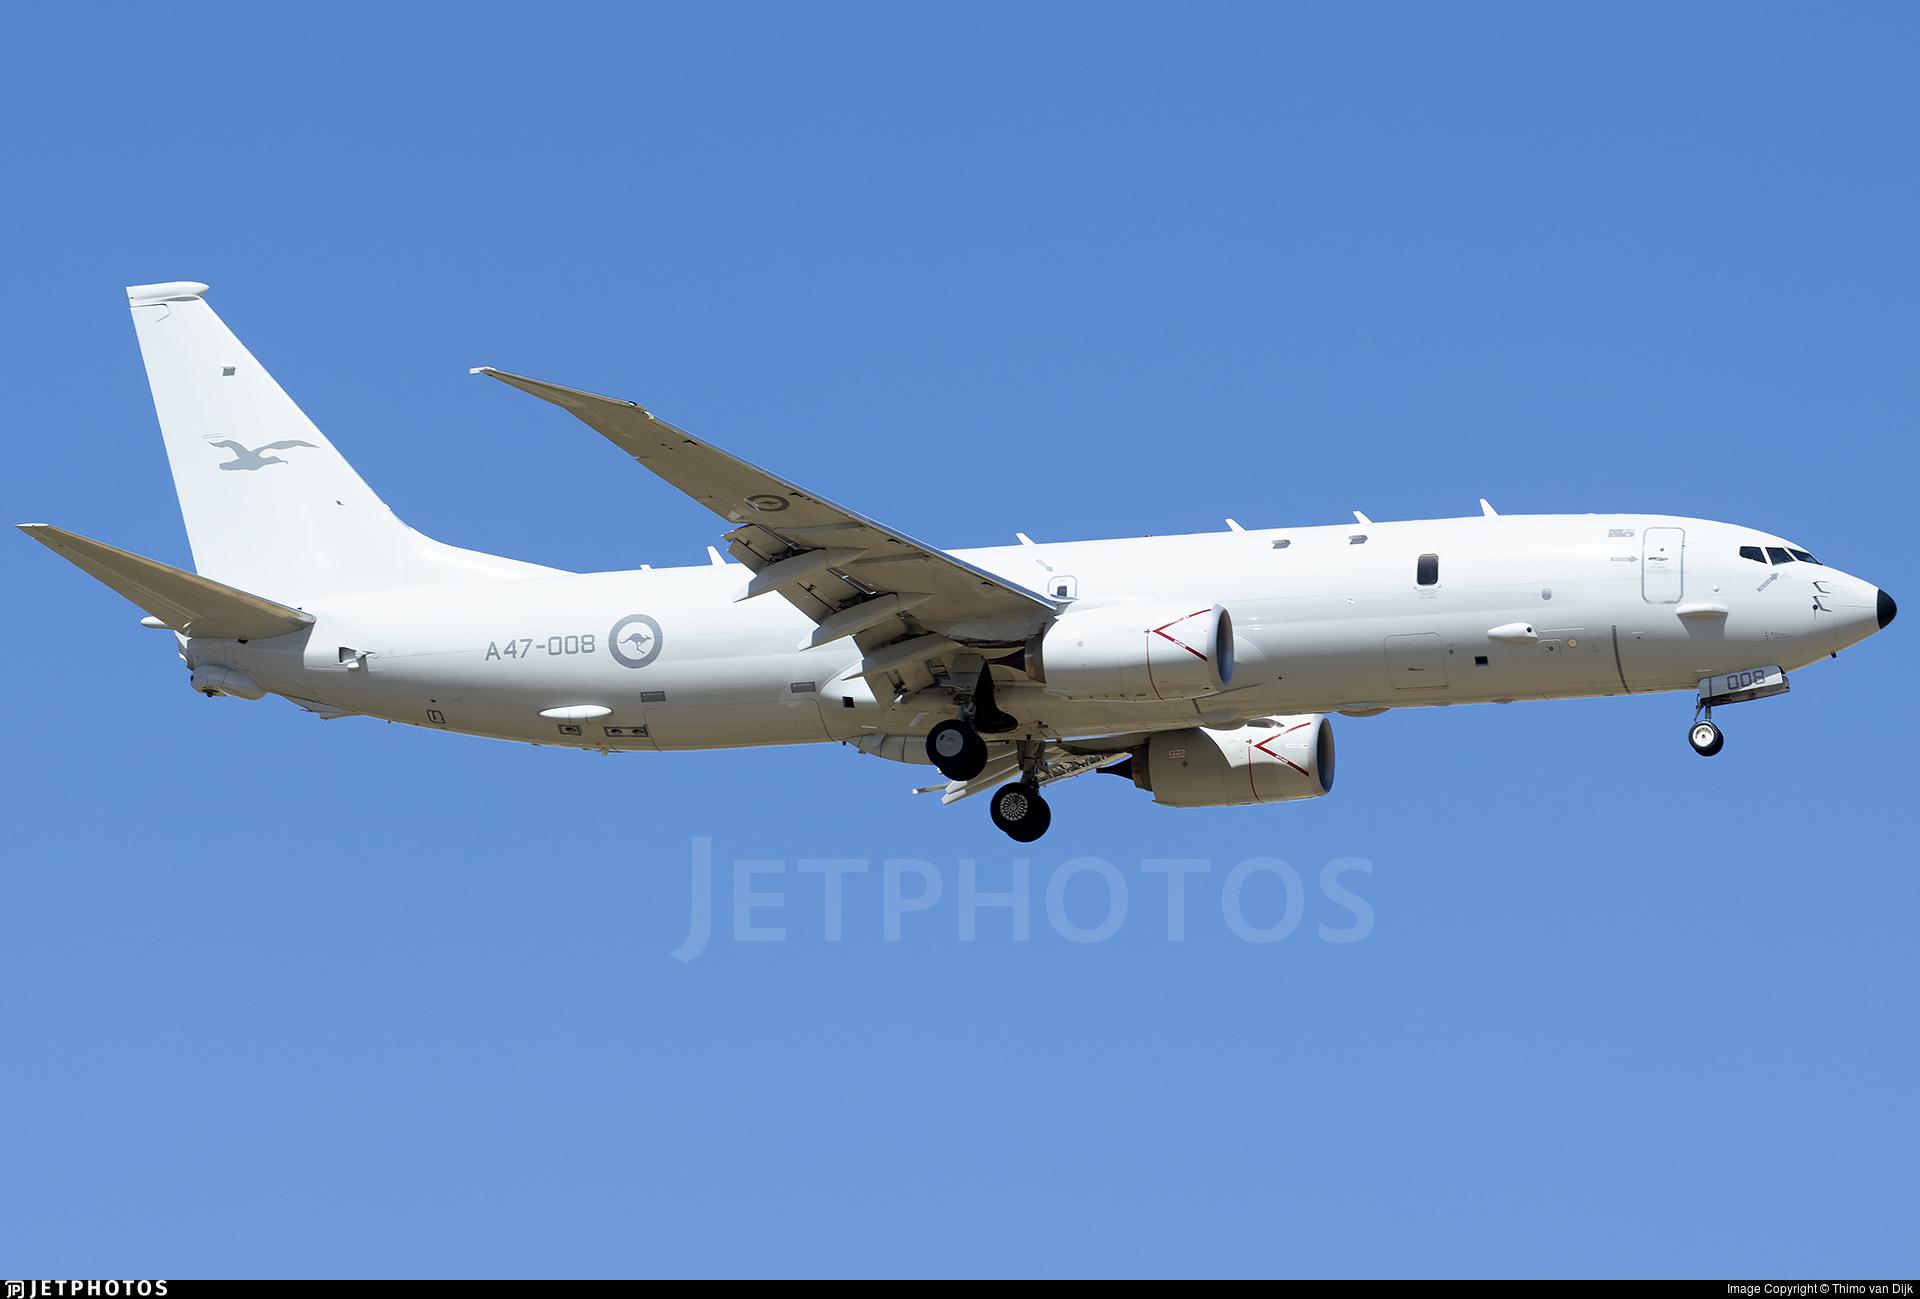 A47-008 - Boeing P-8A Poseidon - Australia - Royal Australian Air Force (RAAF)